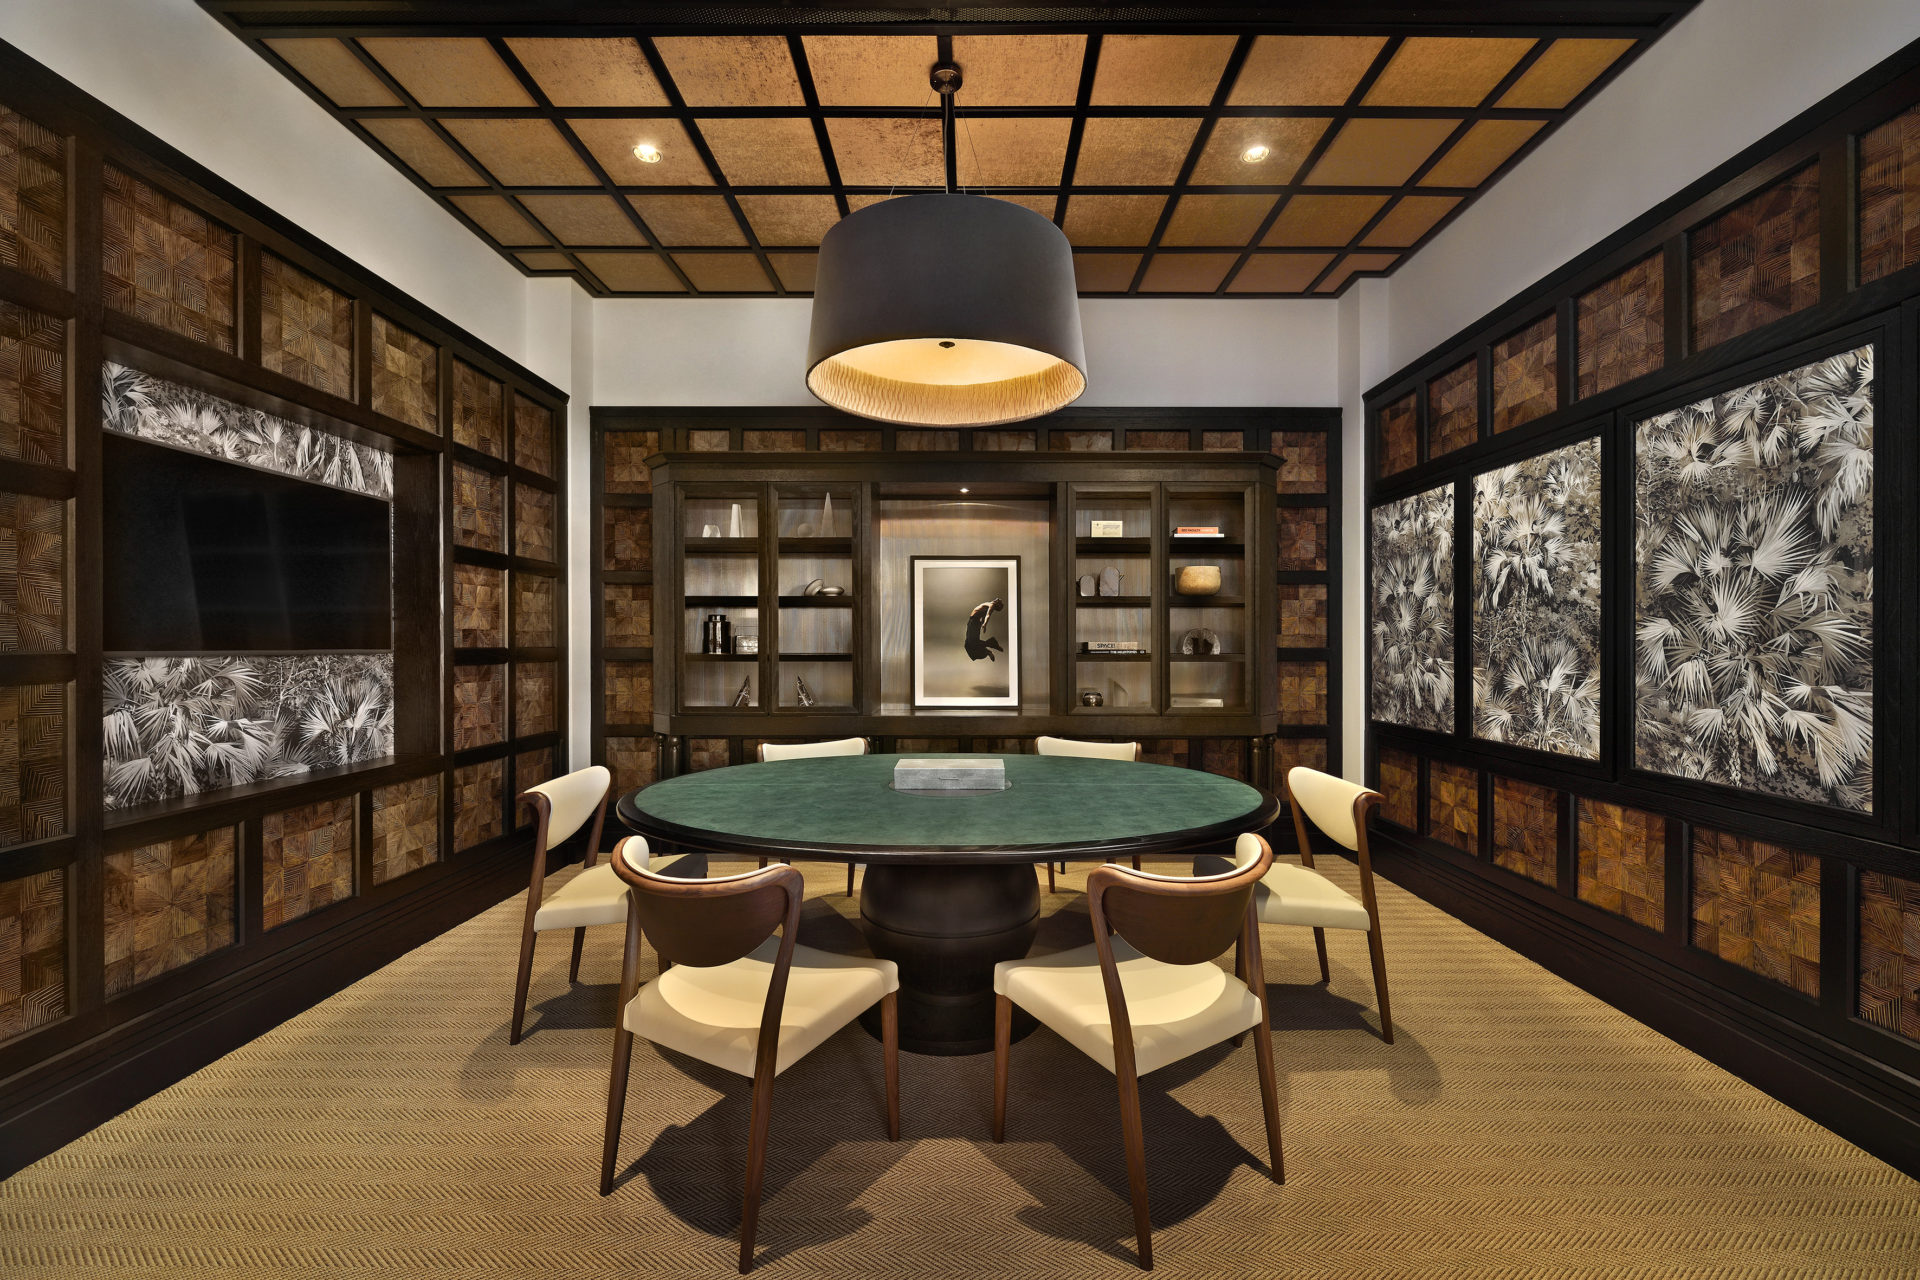 The Great Room Raffles Arcade _Atelier